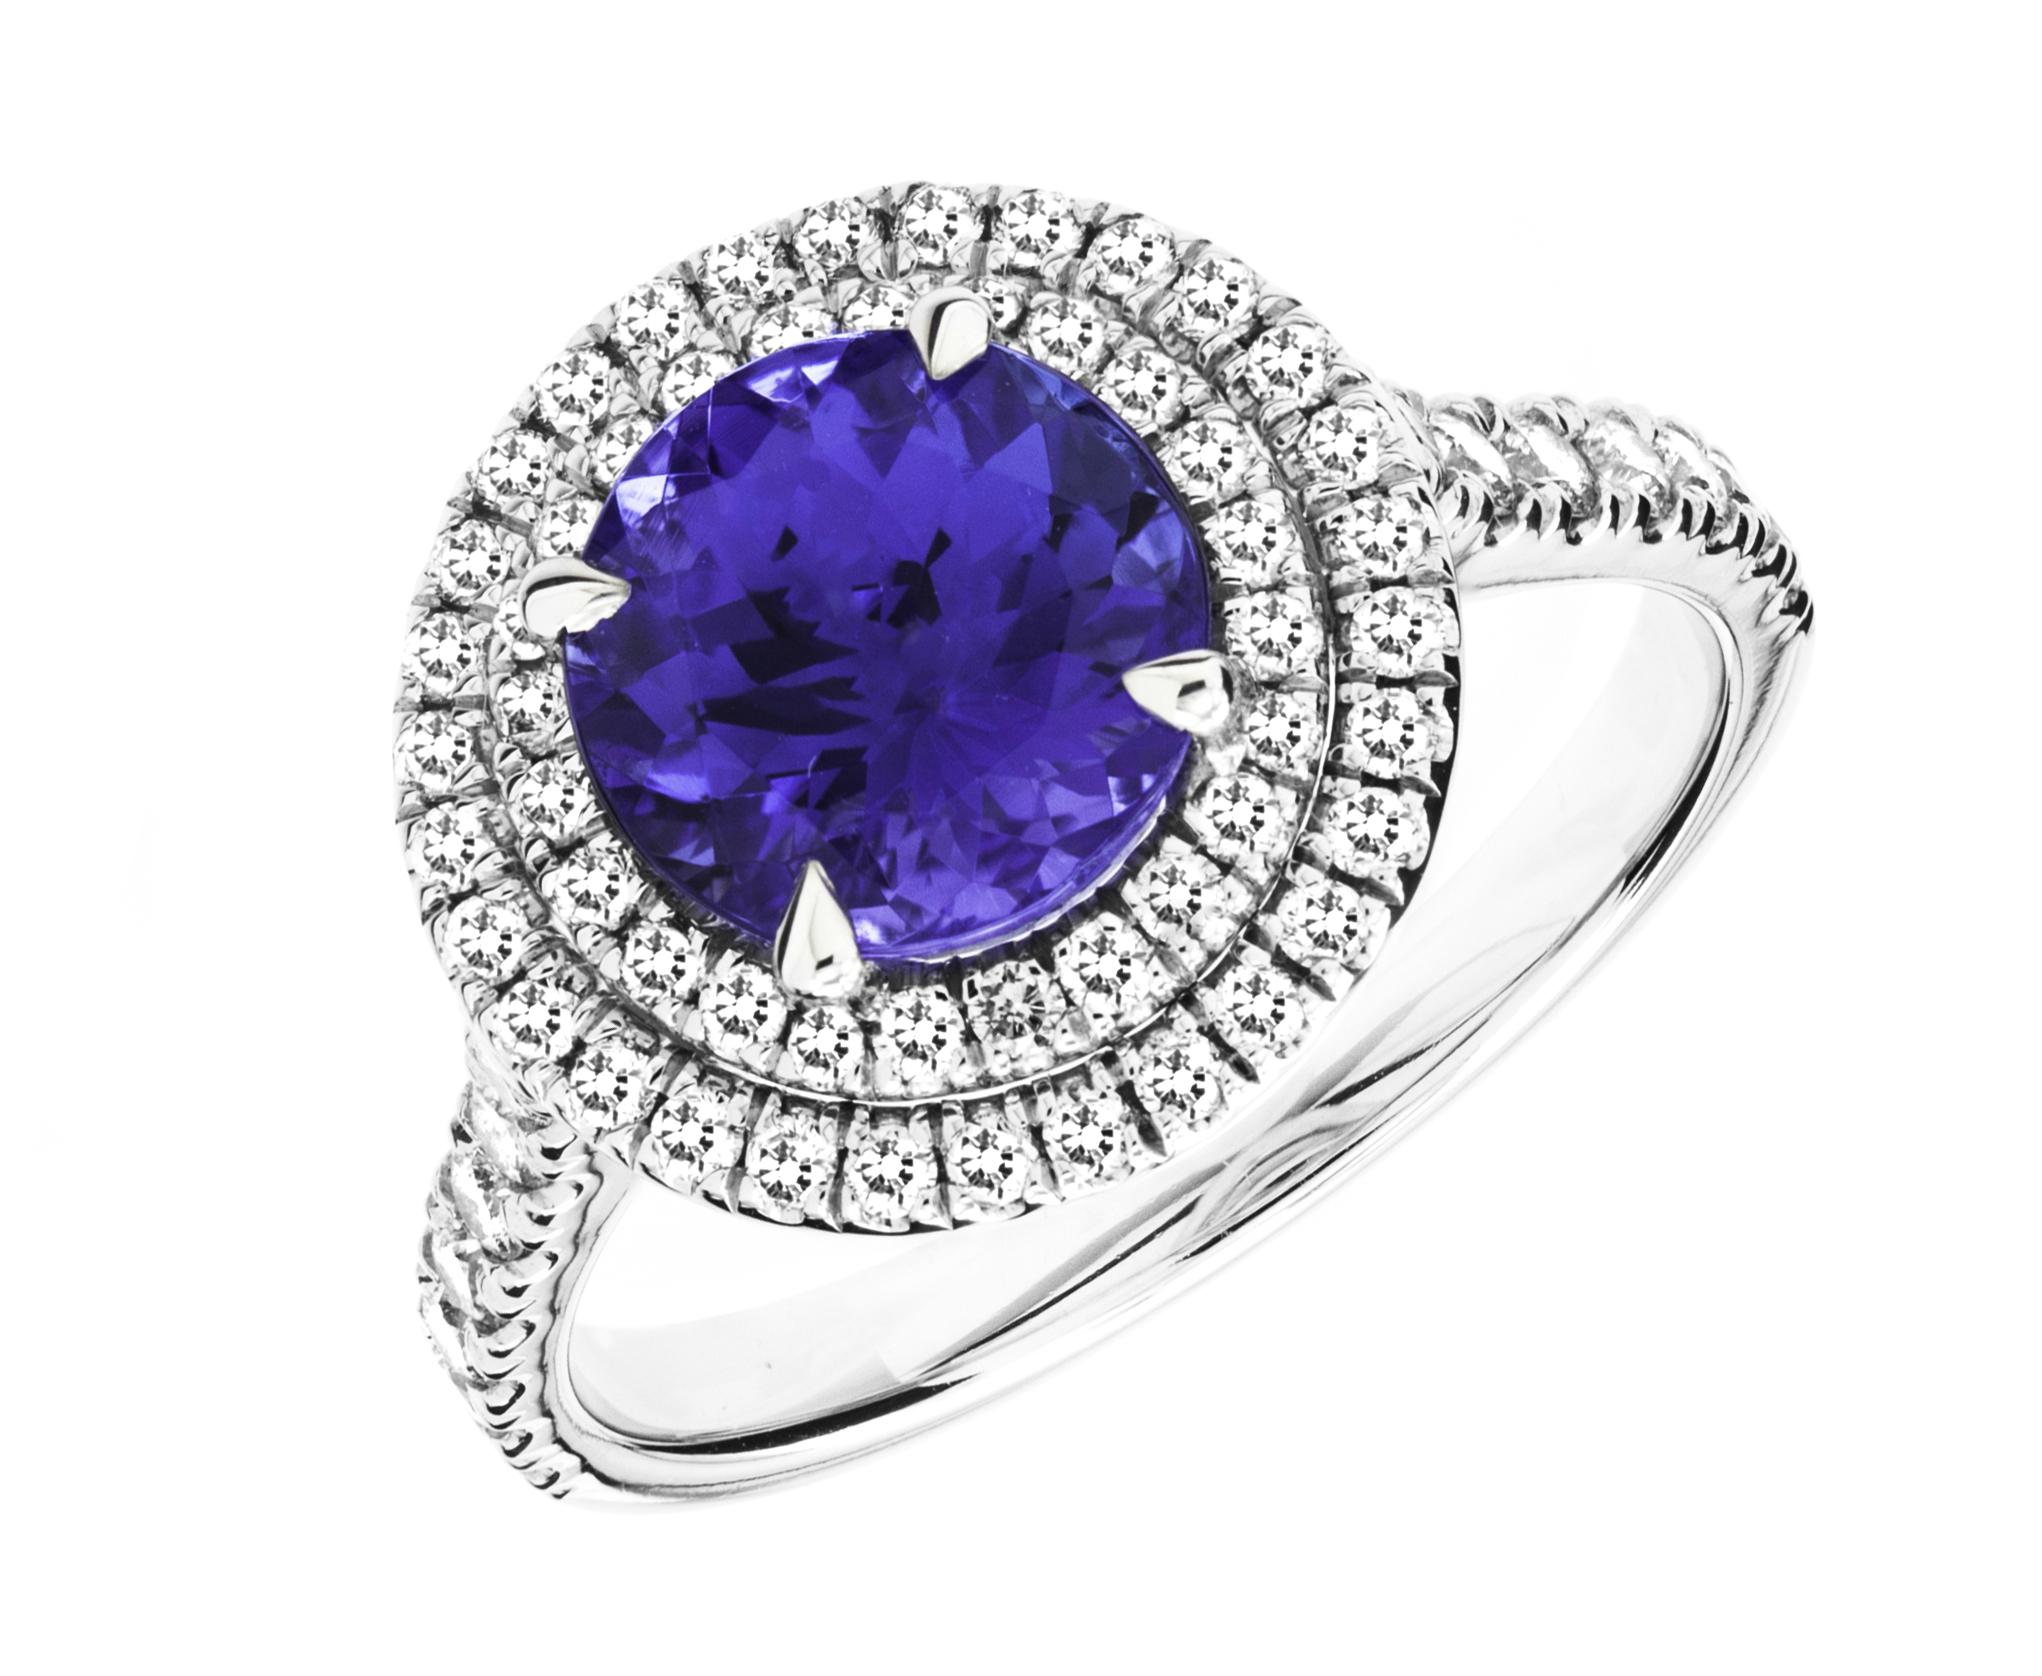 RDT777W-Inel cu Tanzanit si Diamant Dama Aur Alb 18kt cu un Tanzanit Rotund Inconjurat de 68 Diamante Rotund Briliant, Stil Halo-img1